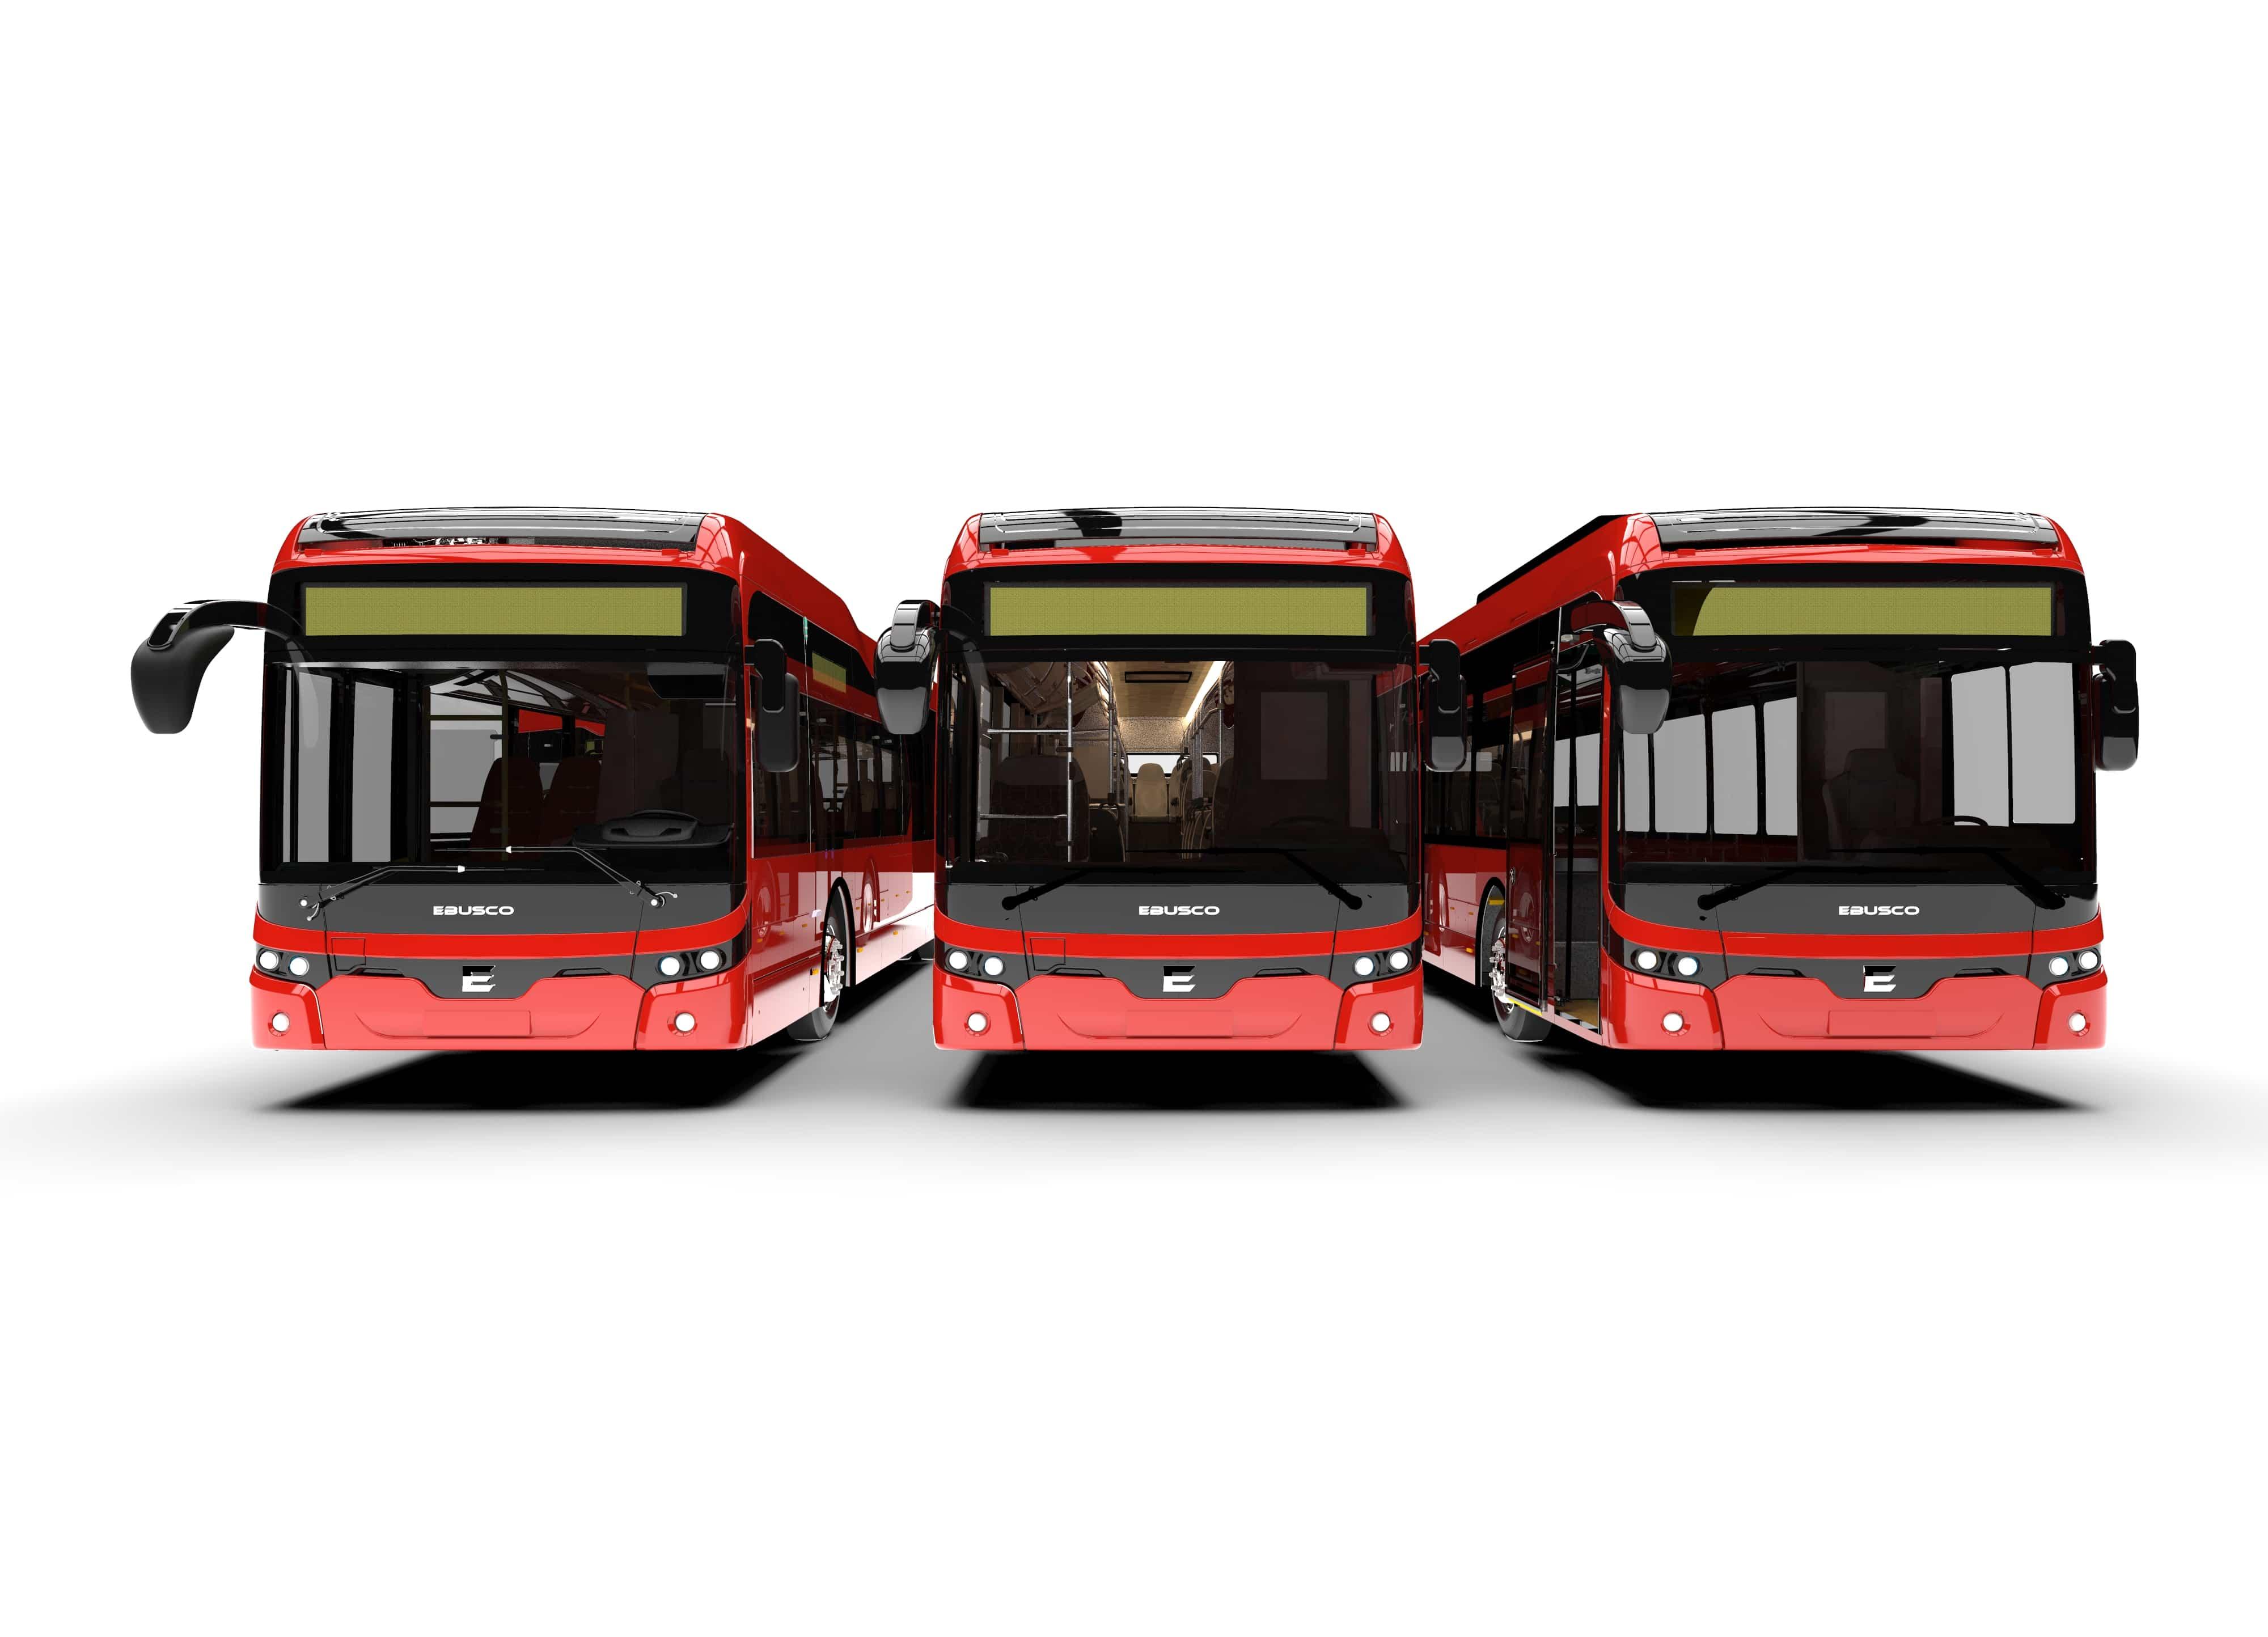 Ebusco eletric buses